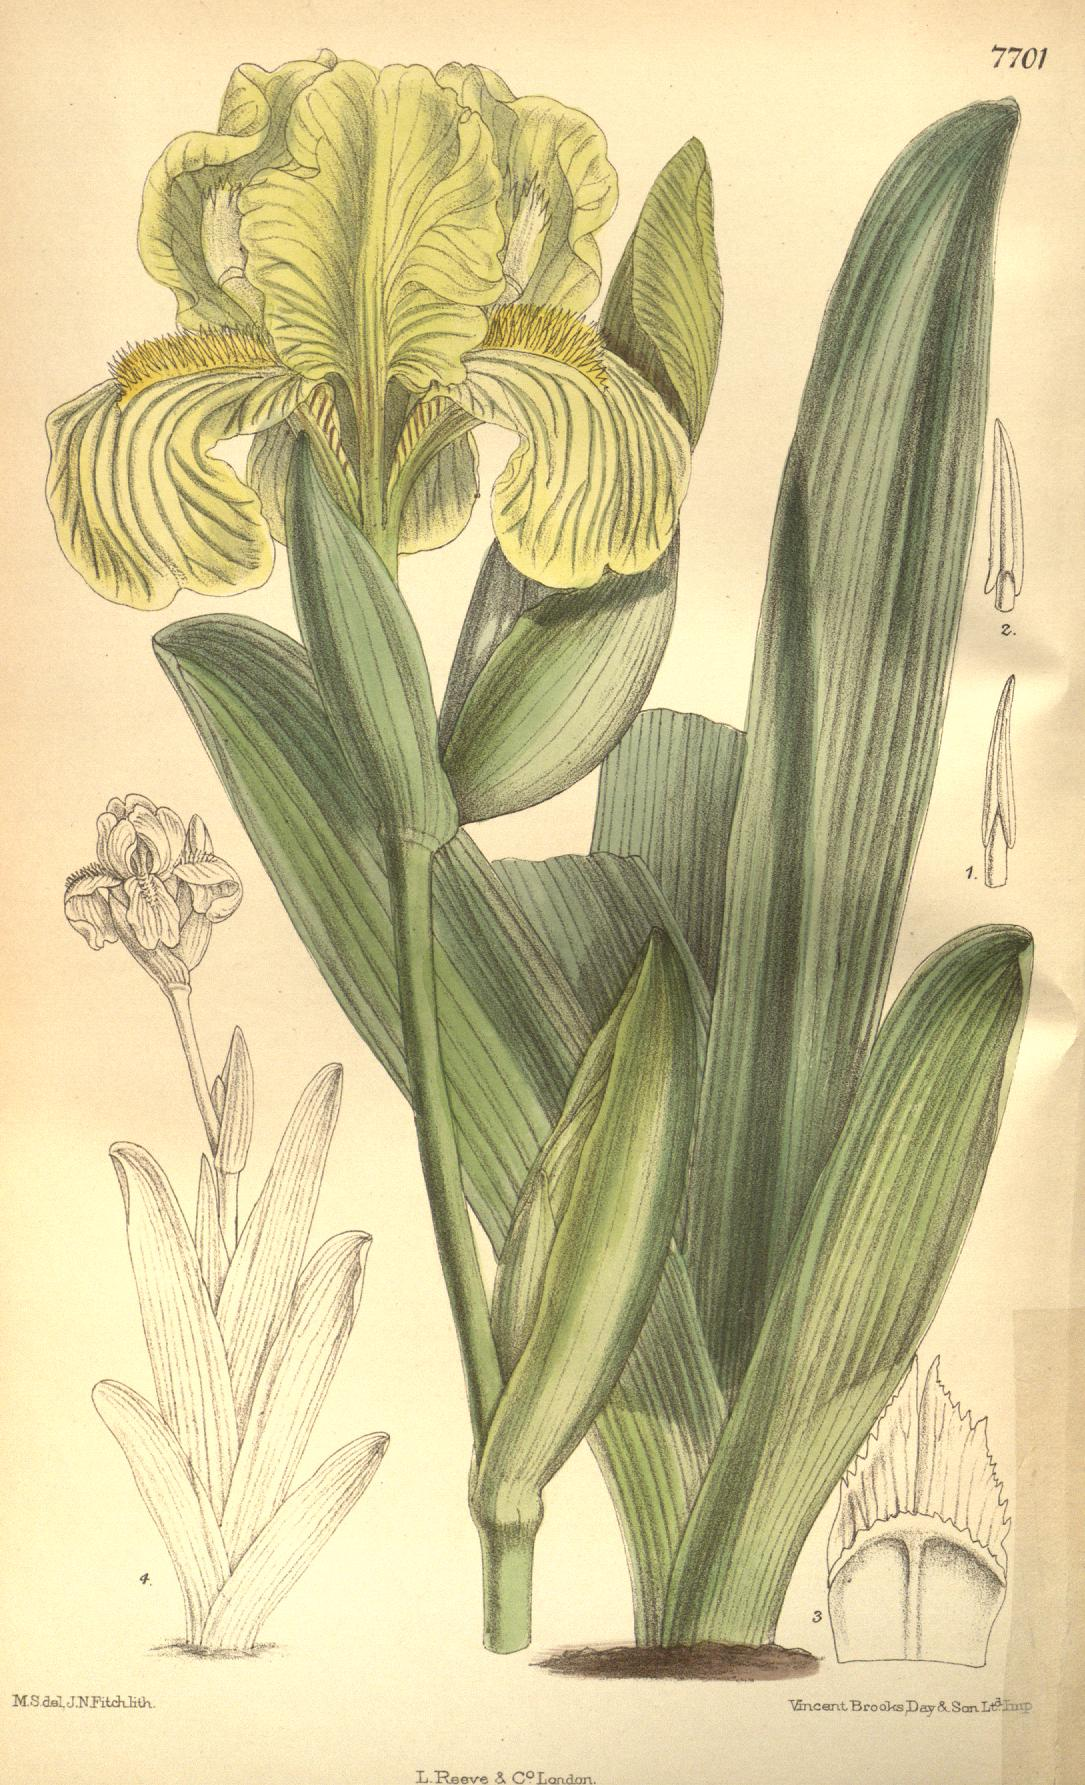 Iris obtusifolia